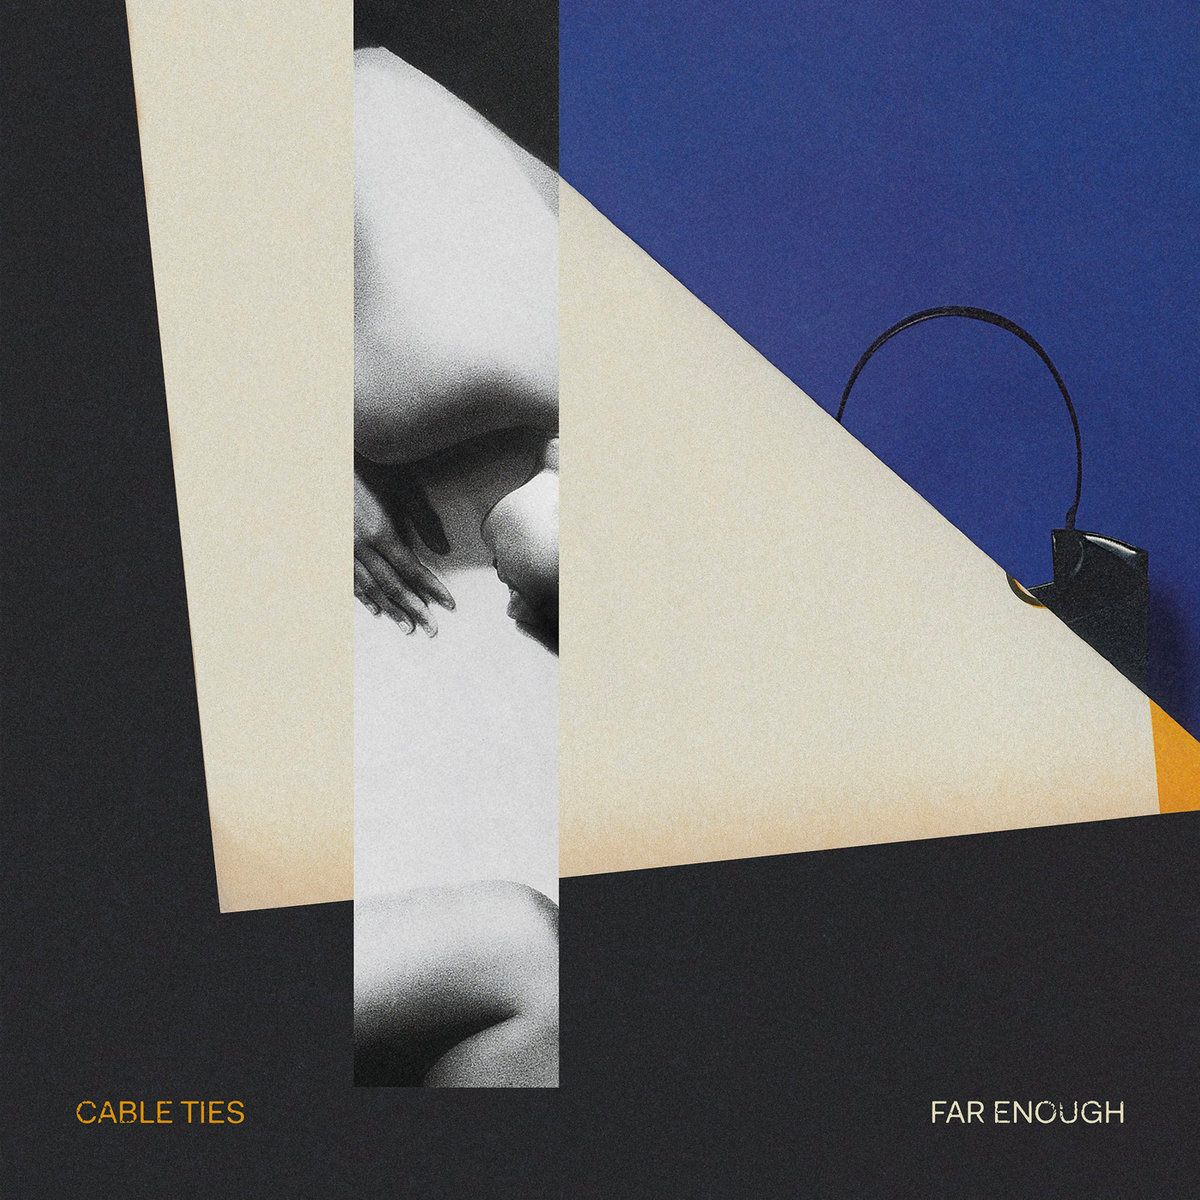 Cable Ties album cover Far Enough